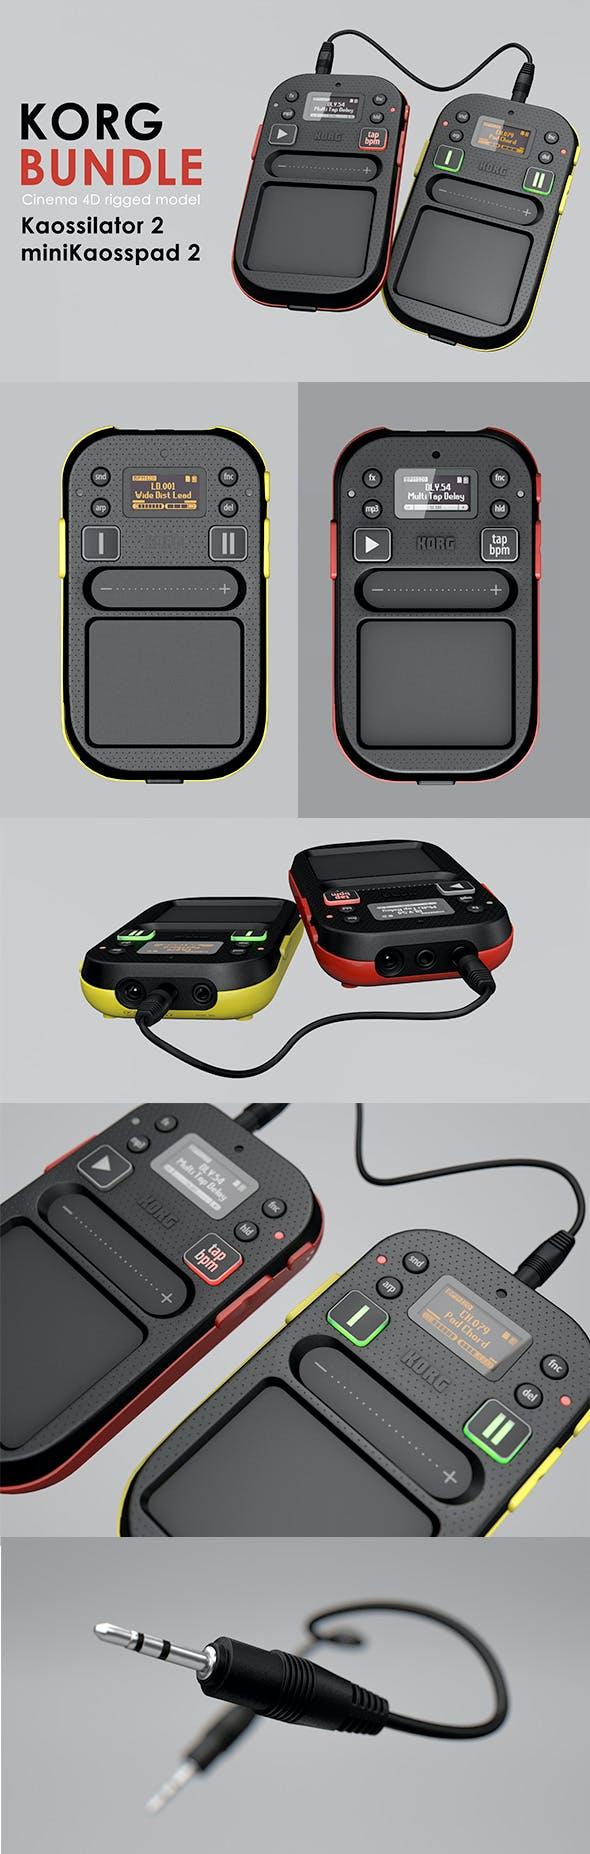 Korg Kaossilator 2 and miniKaosspad 2 Rigged - 3DOcean Item for Sale